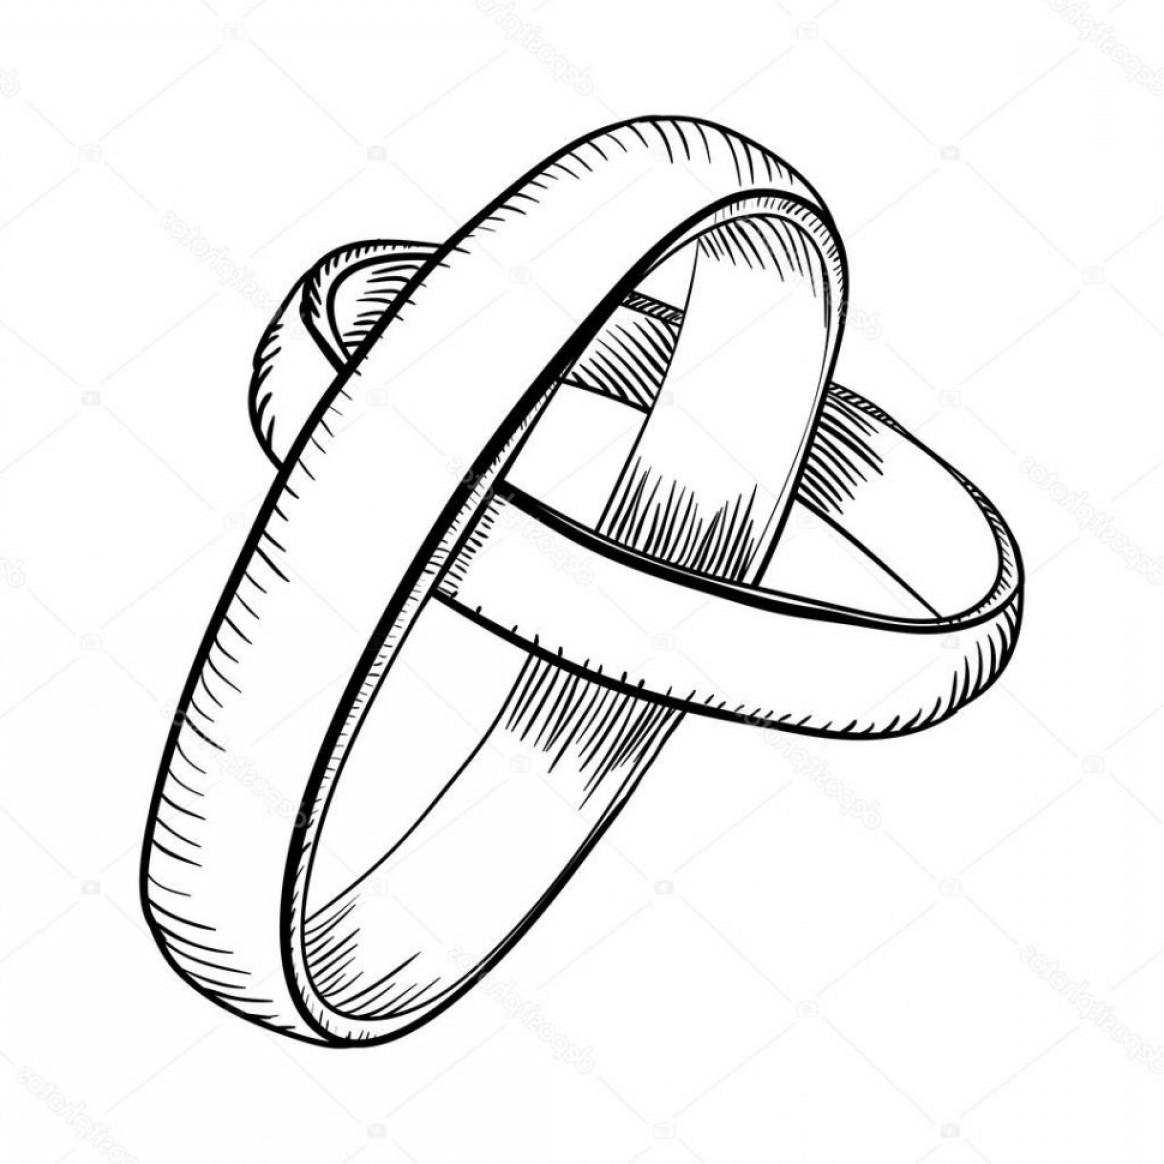 1164x1164 How To Draw Interlocking Wedding Rings How To Draw A Cartoon